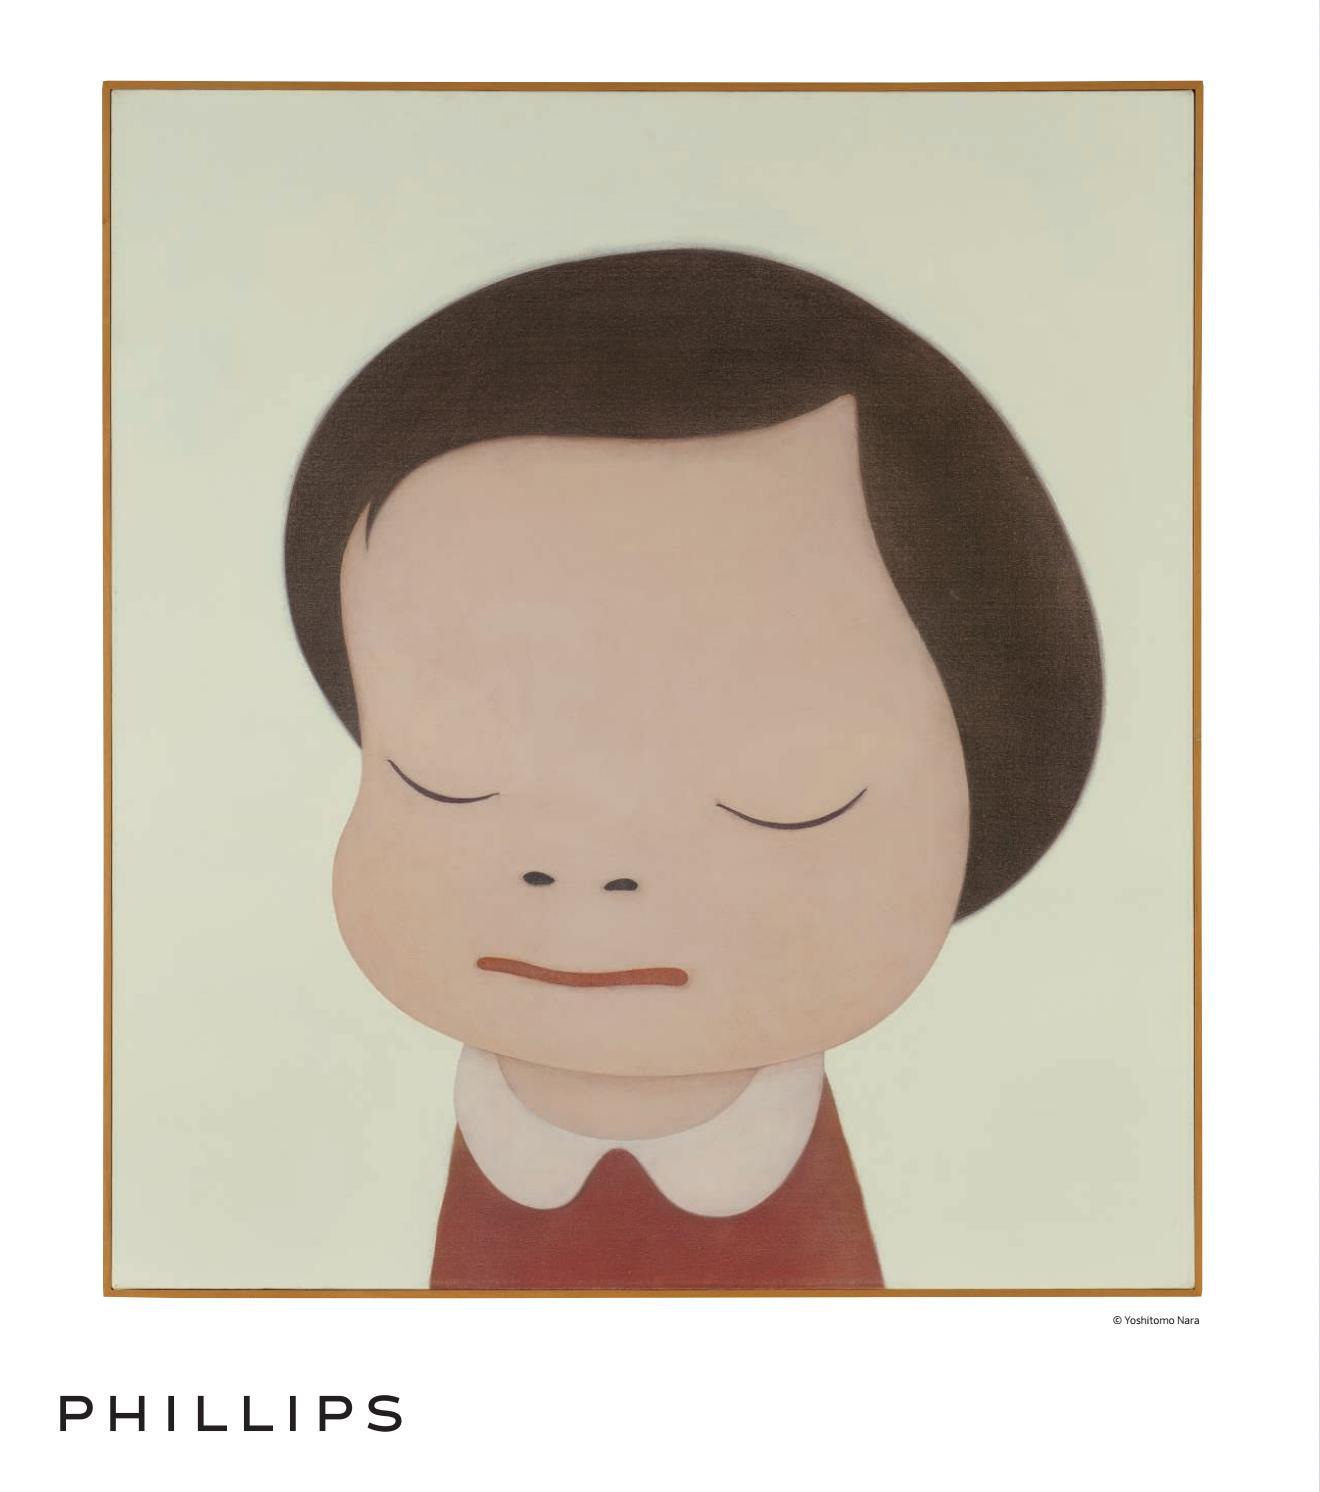 "650 THREE MUSICIANS PICASSO PABLO Artwork Reproduction 11/"" x 14/"""